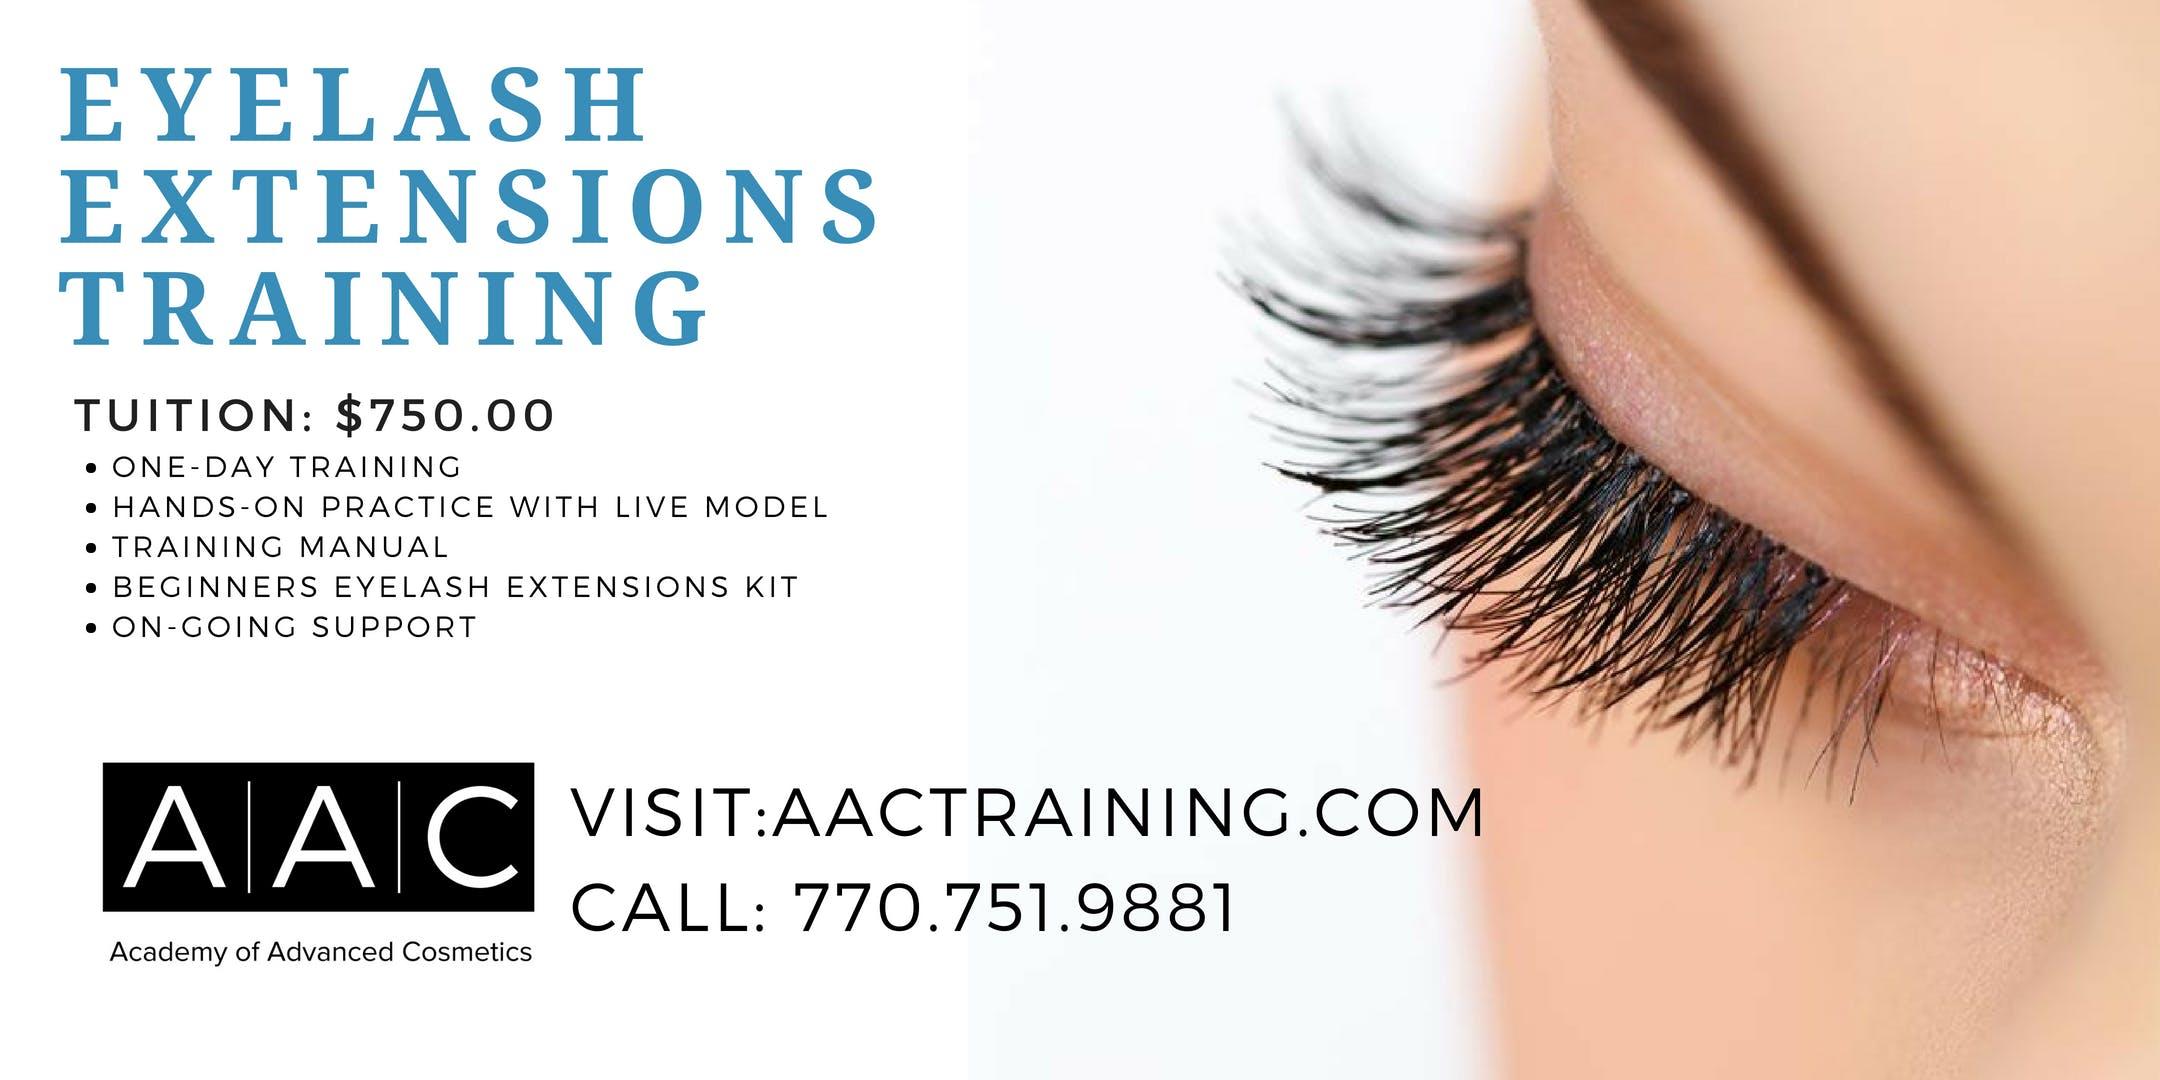 Eyelash Extensions Certification Training 24 Jan 2019